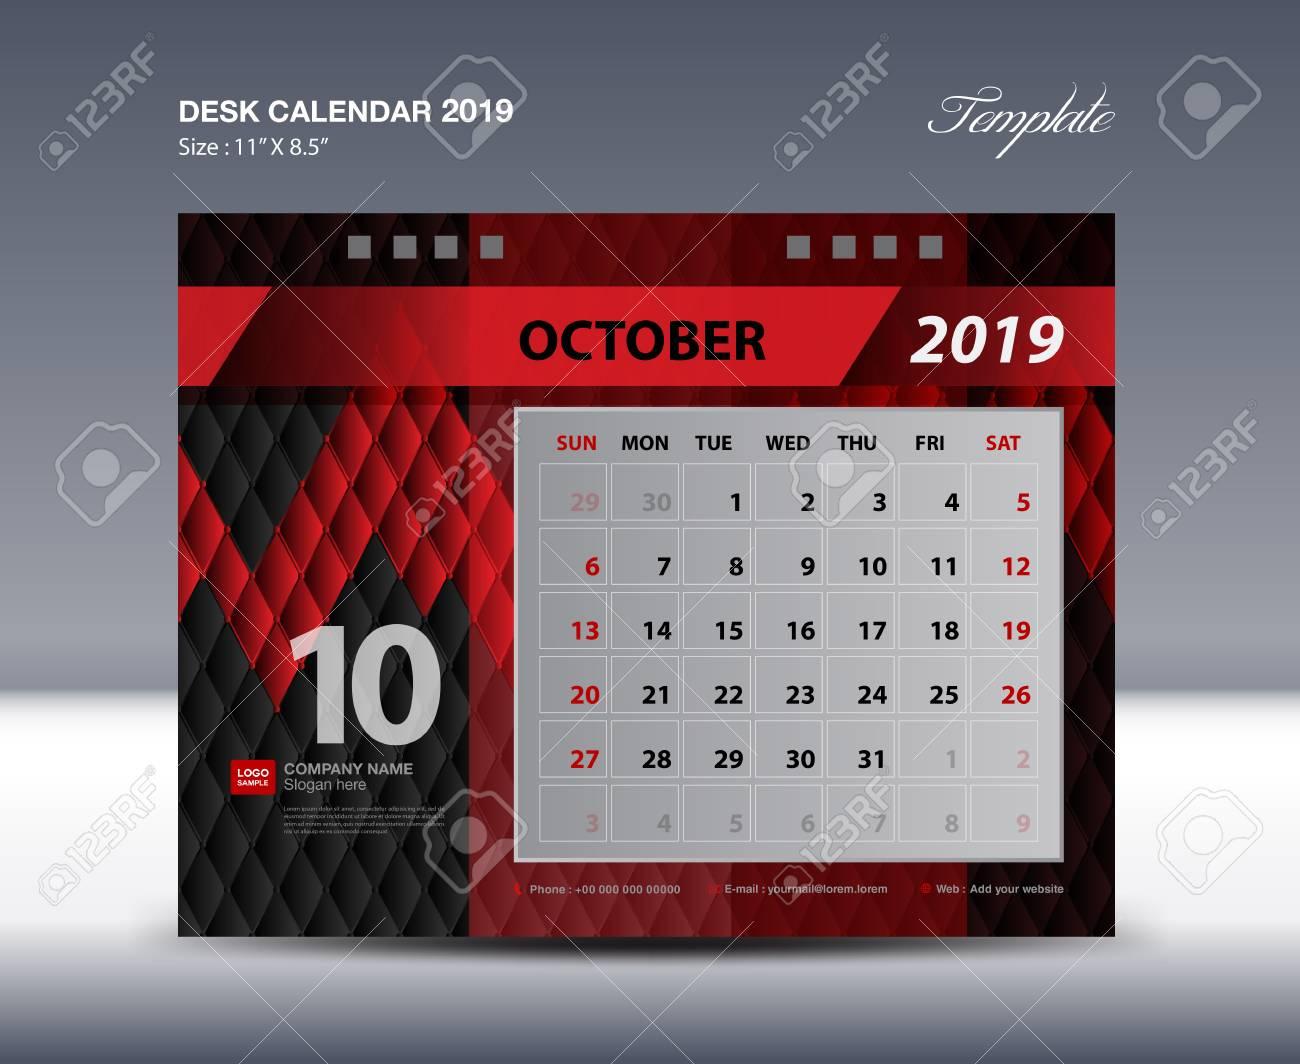 October Desk Calendar 2019 Template Week Starts Sunday Stationery